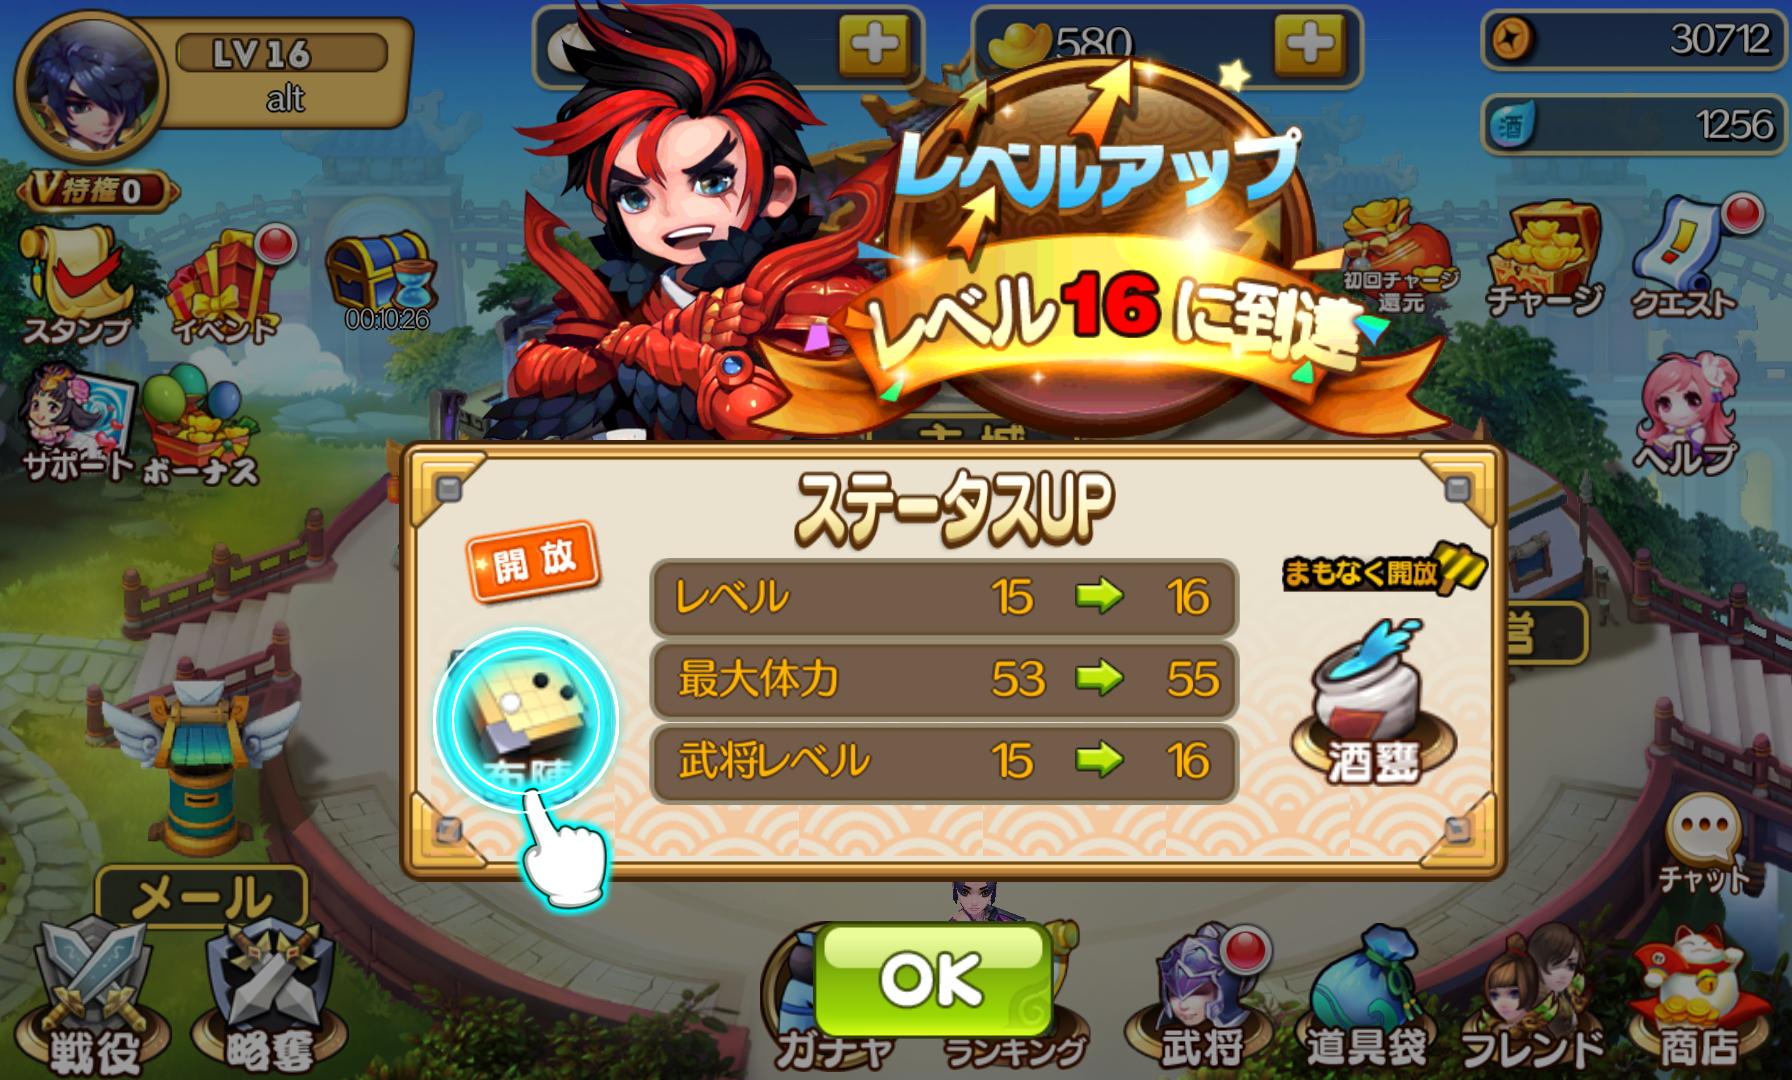 androidアプリ 三国志繚乱バトル攻略スクリーンショット4